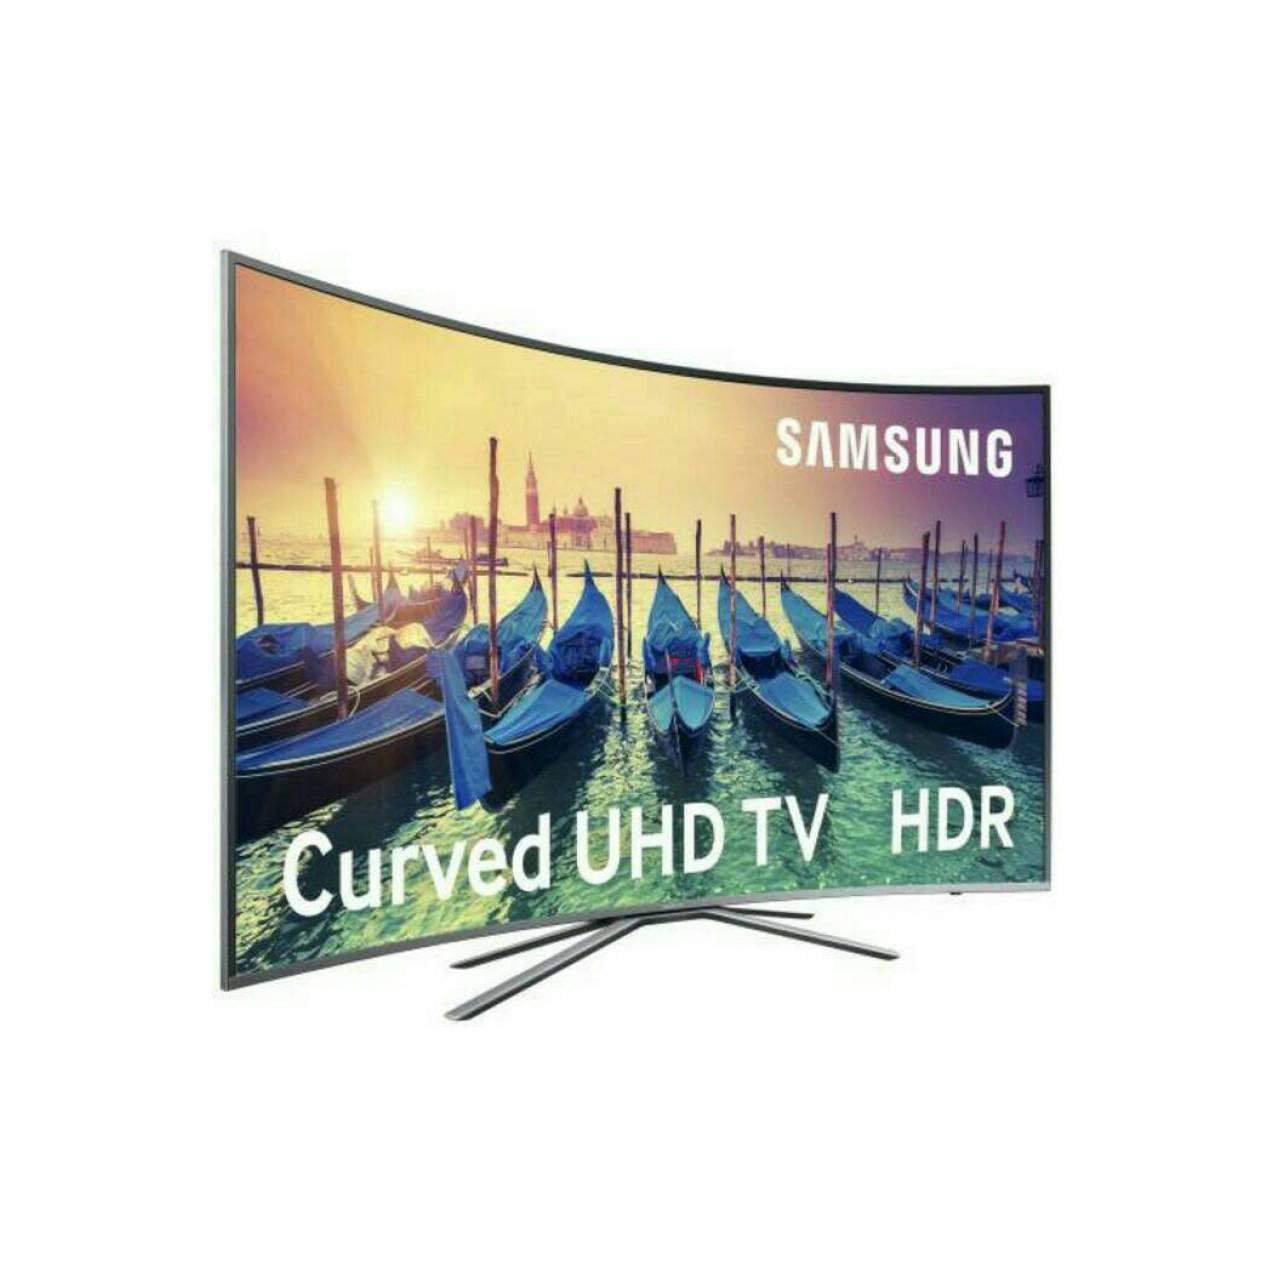 SAMSUNG SMART TV CURVED UHD 40inch KU6300 series 6